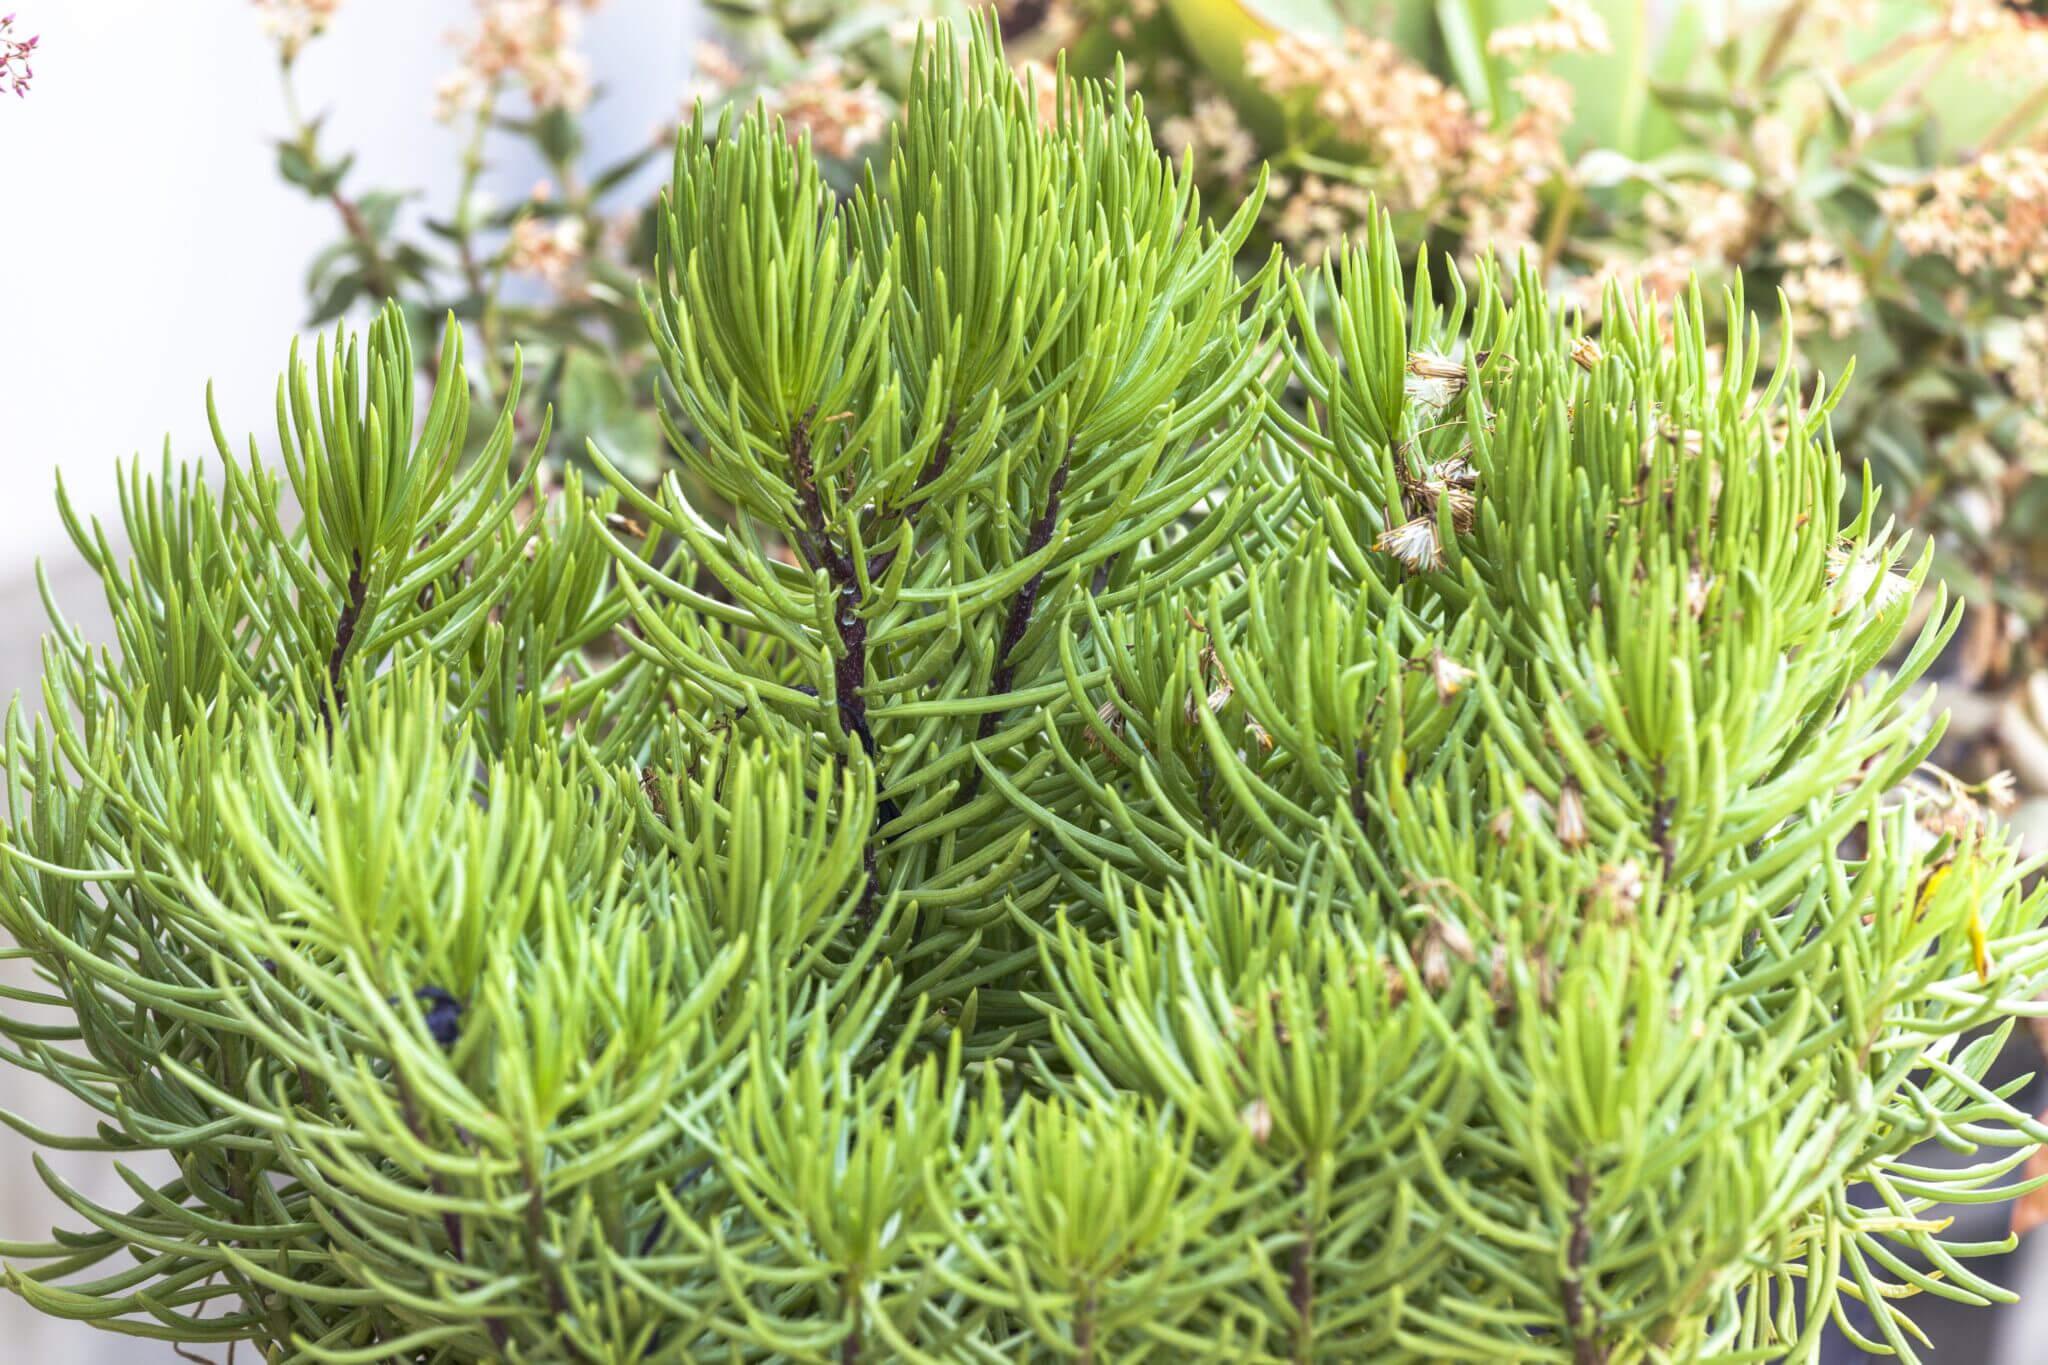 Asteraceae Senecio barbertonicus